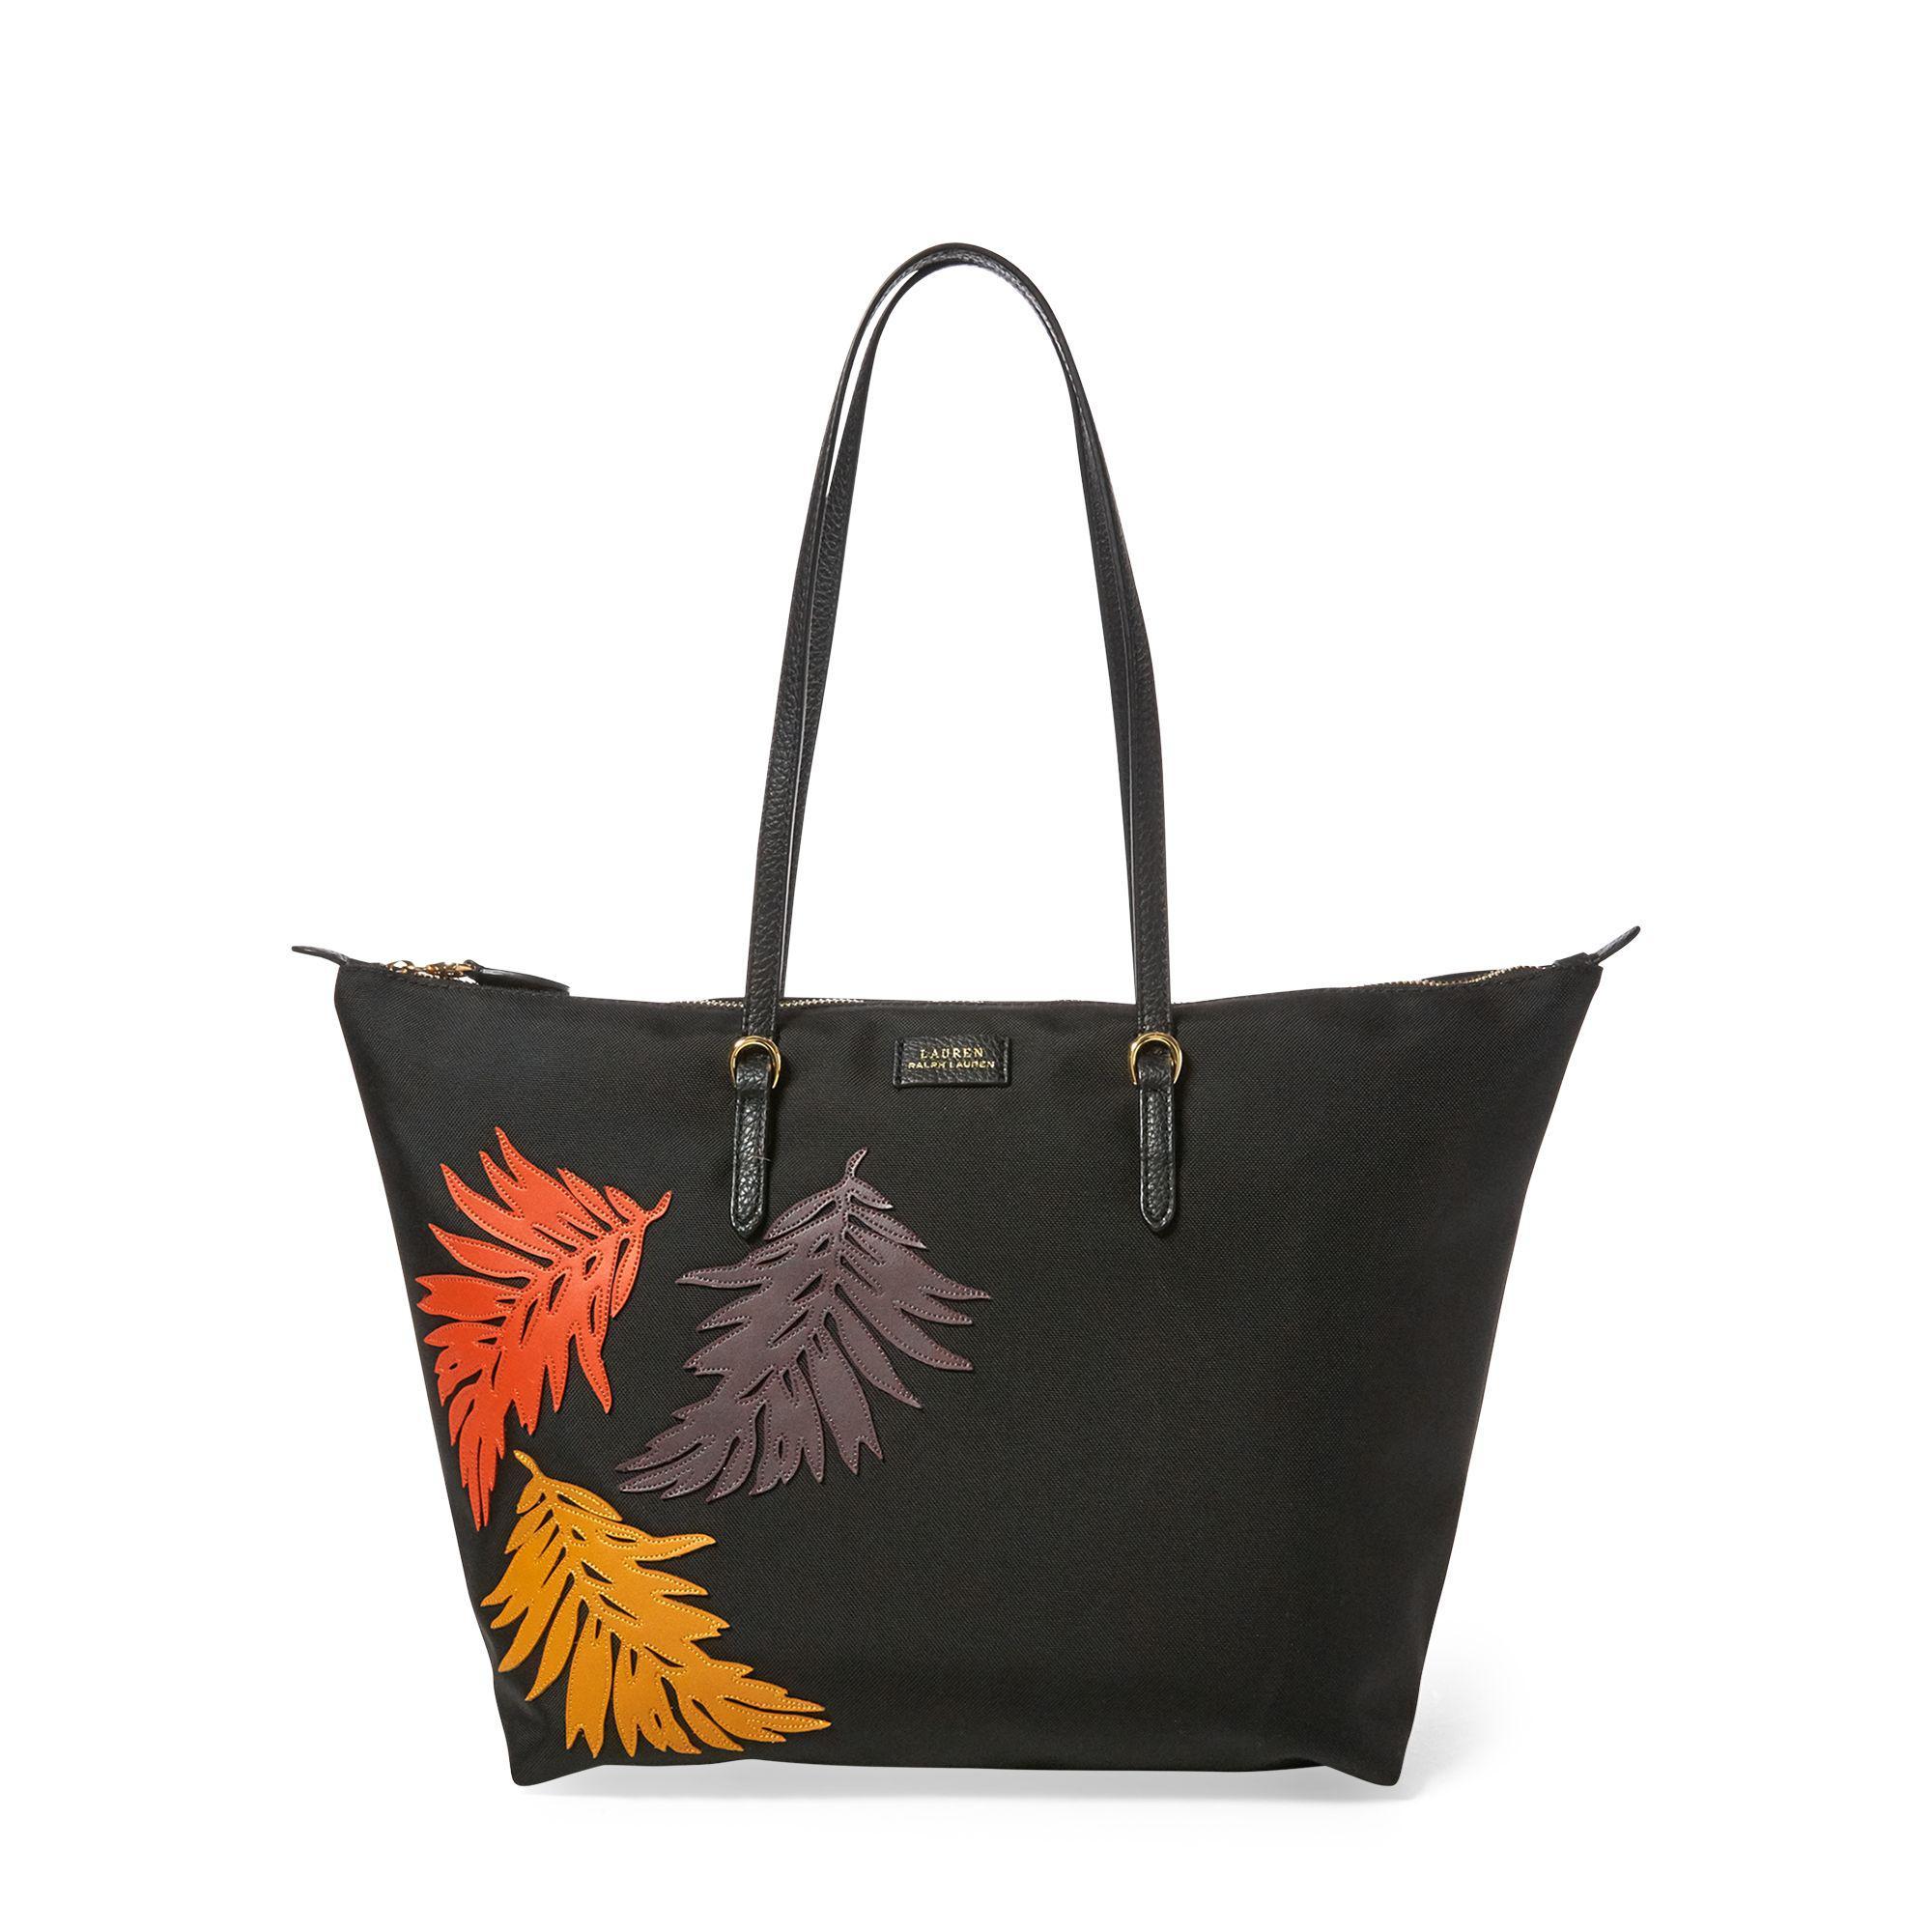 Lyst - Ralph Lauren Palm Leaf Tote Bag in Black 3ec0ad6356